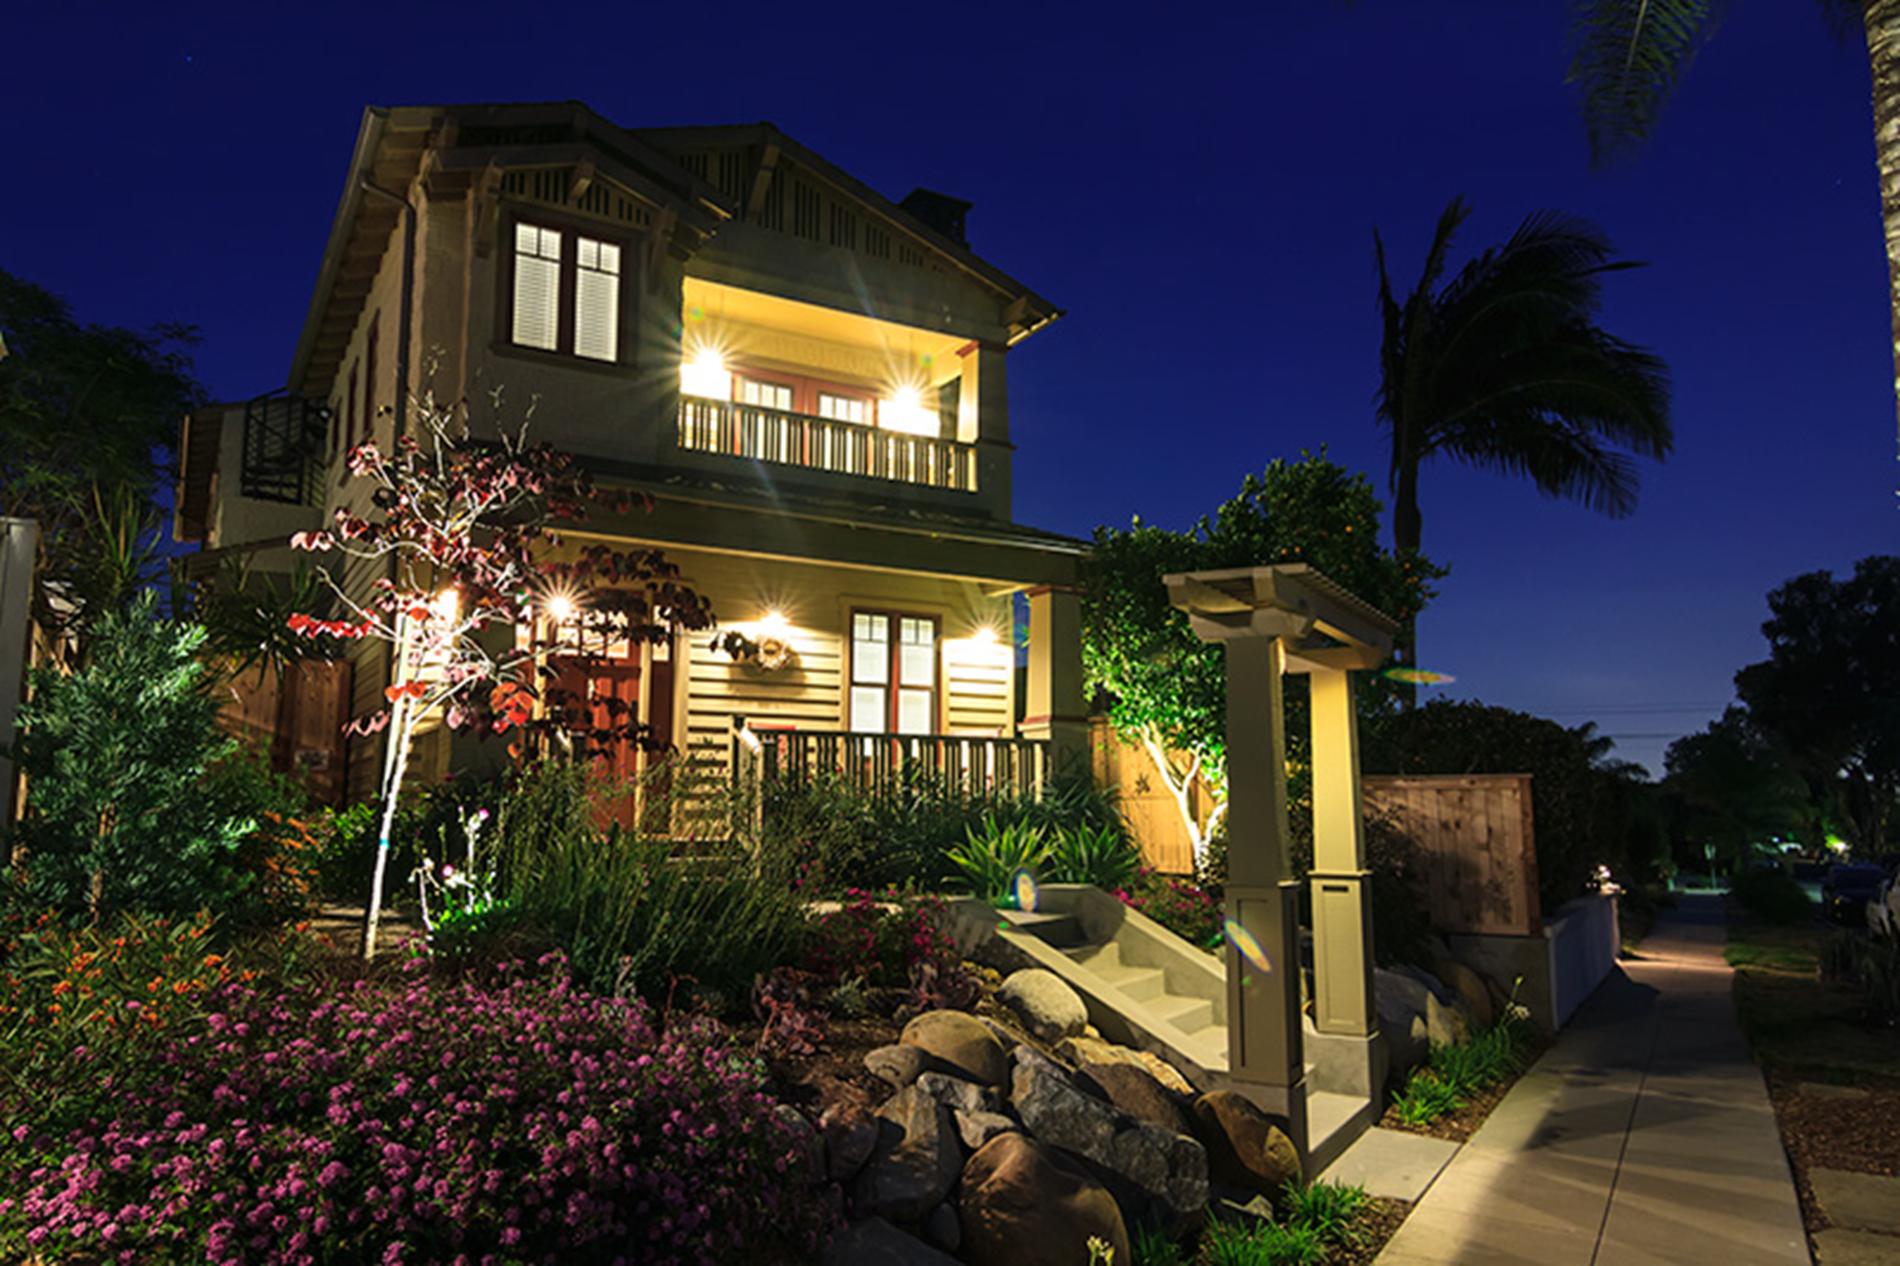 GCBH_La_Jolla_Craftsman_Beach_House_1_featured_1900